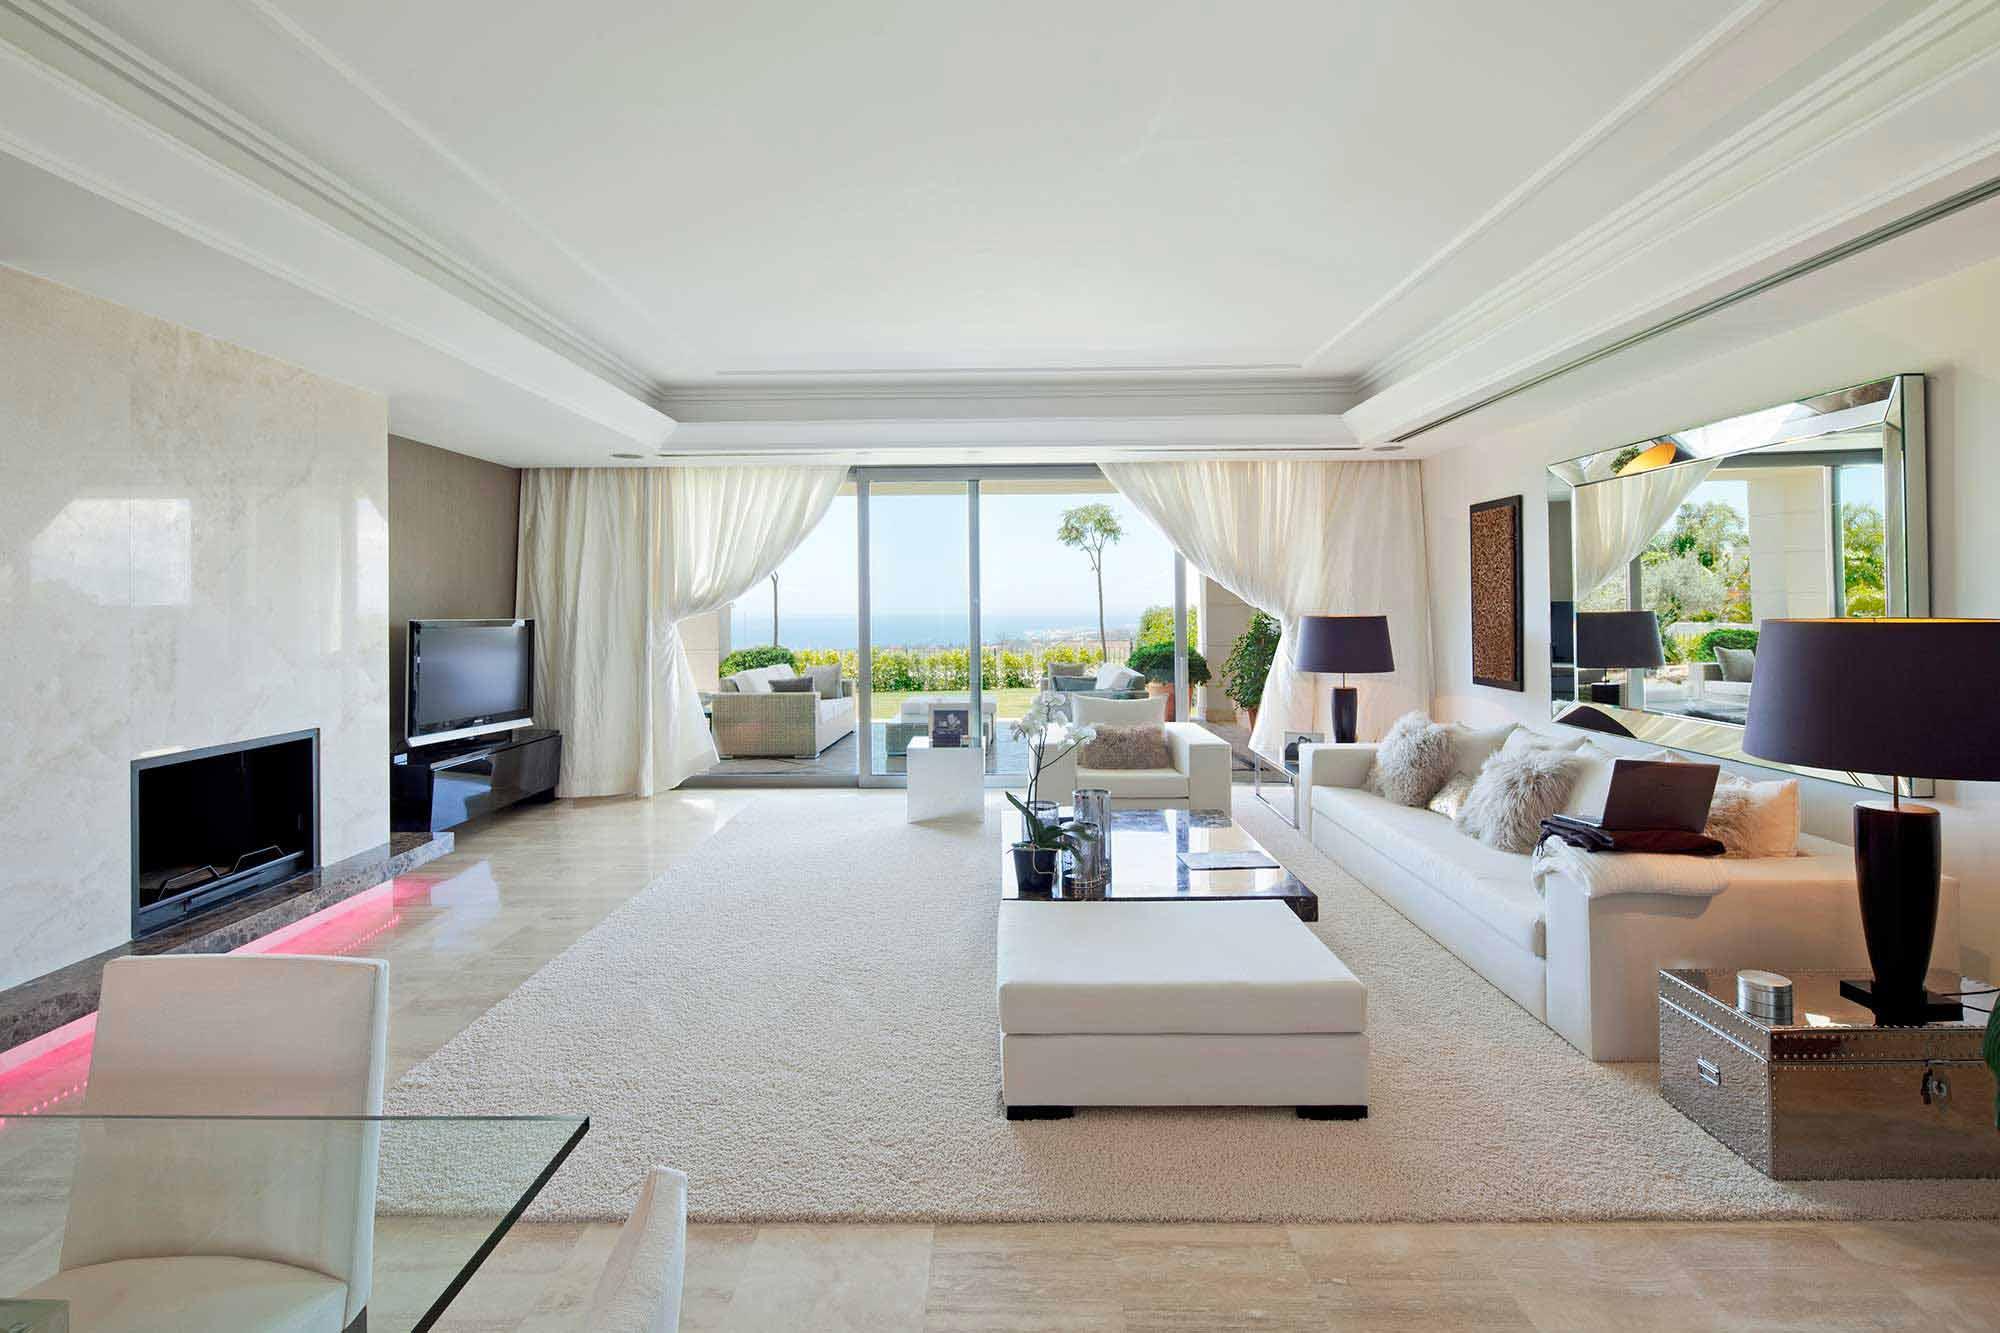 Marbella centro o urbanizaciones